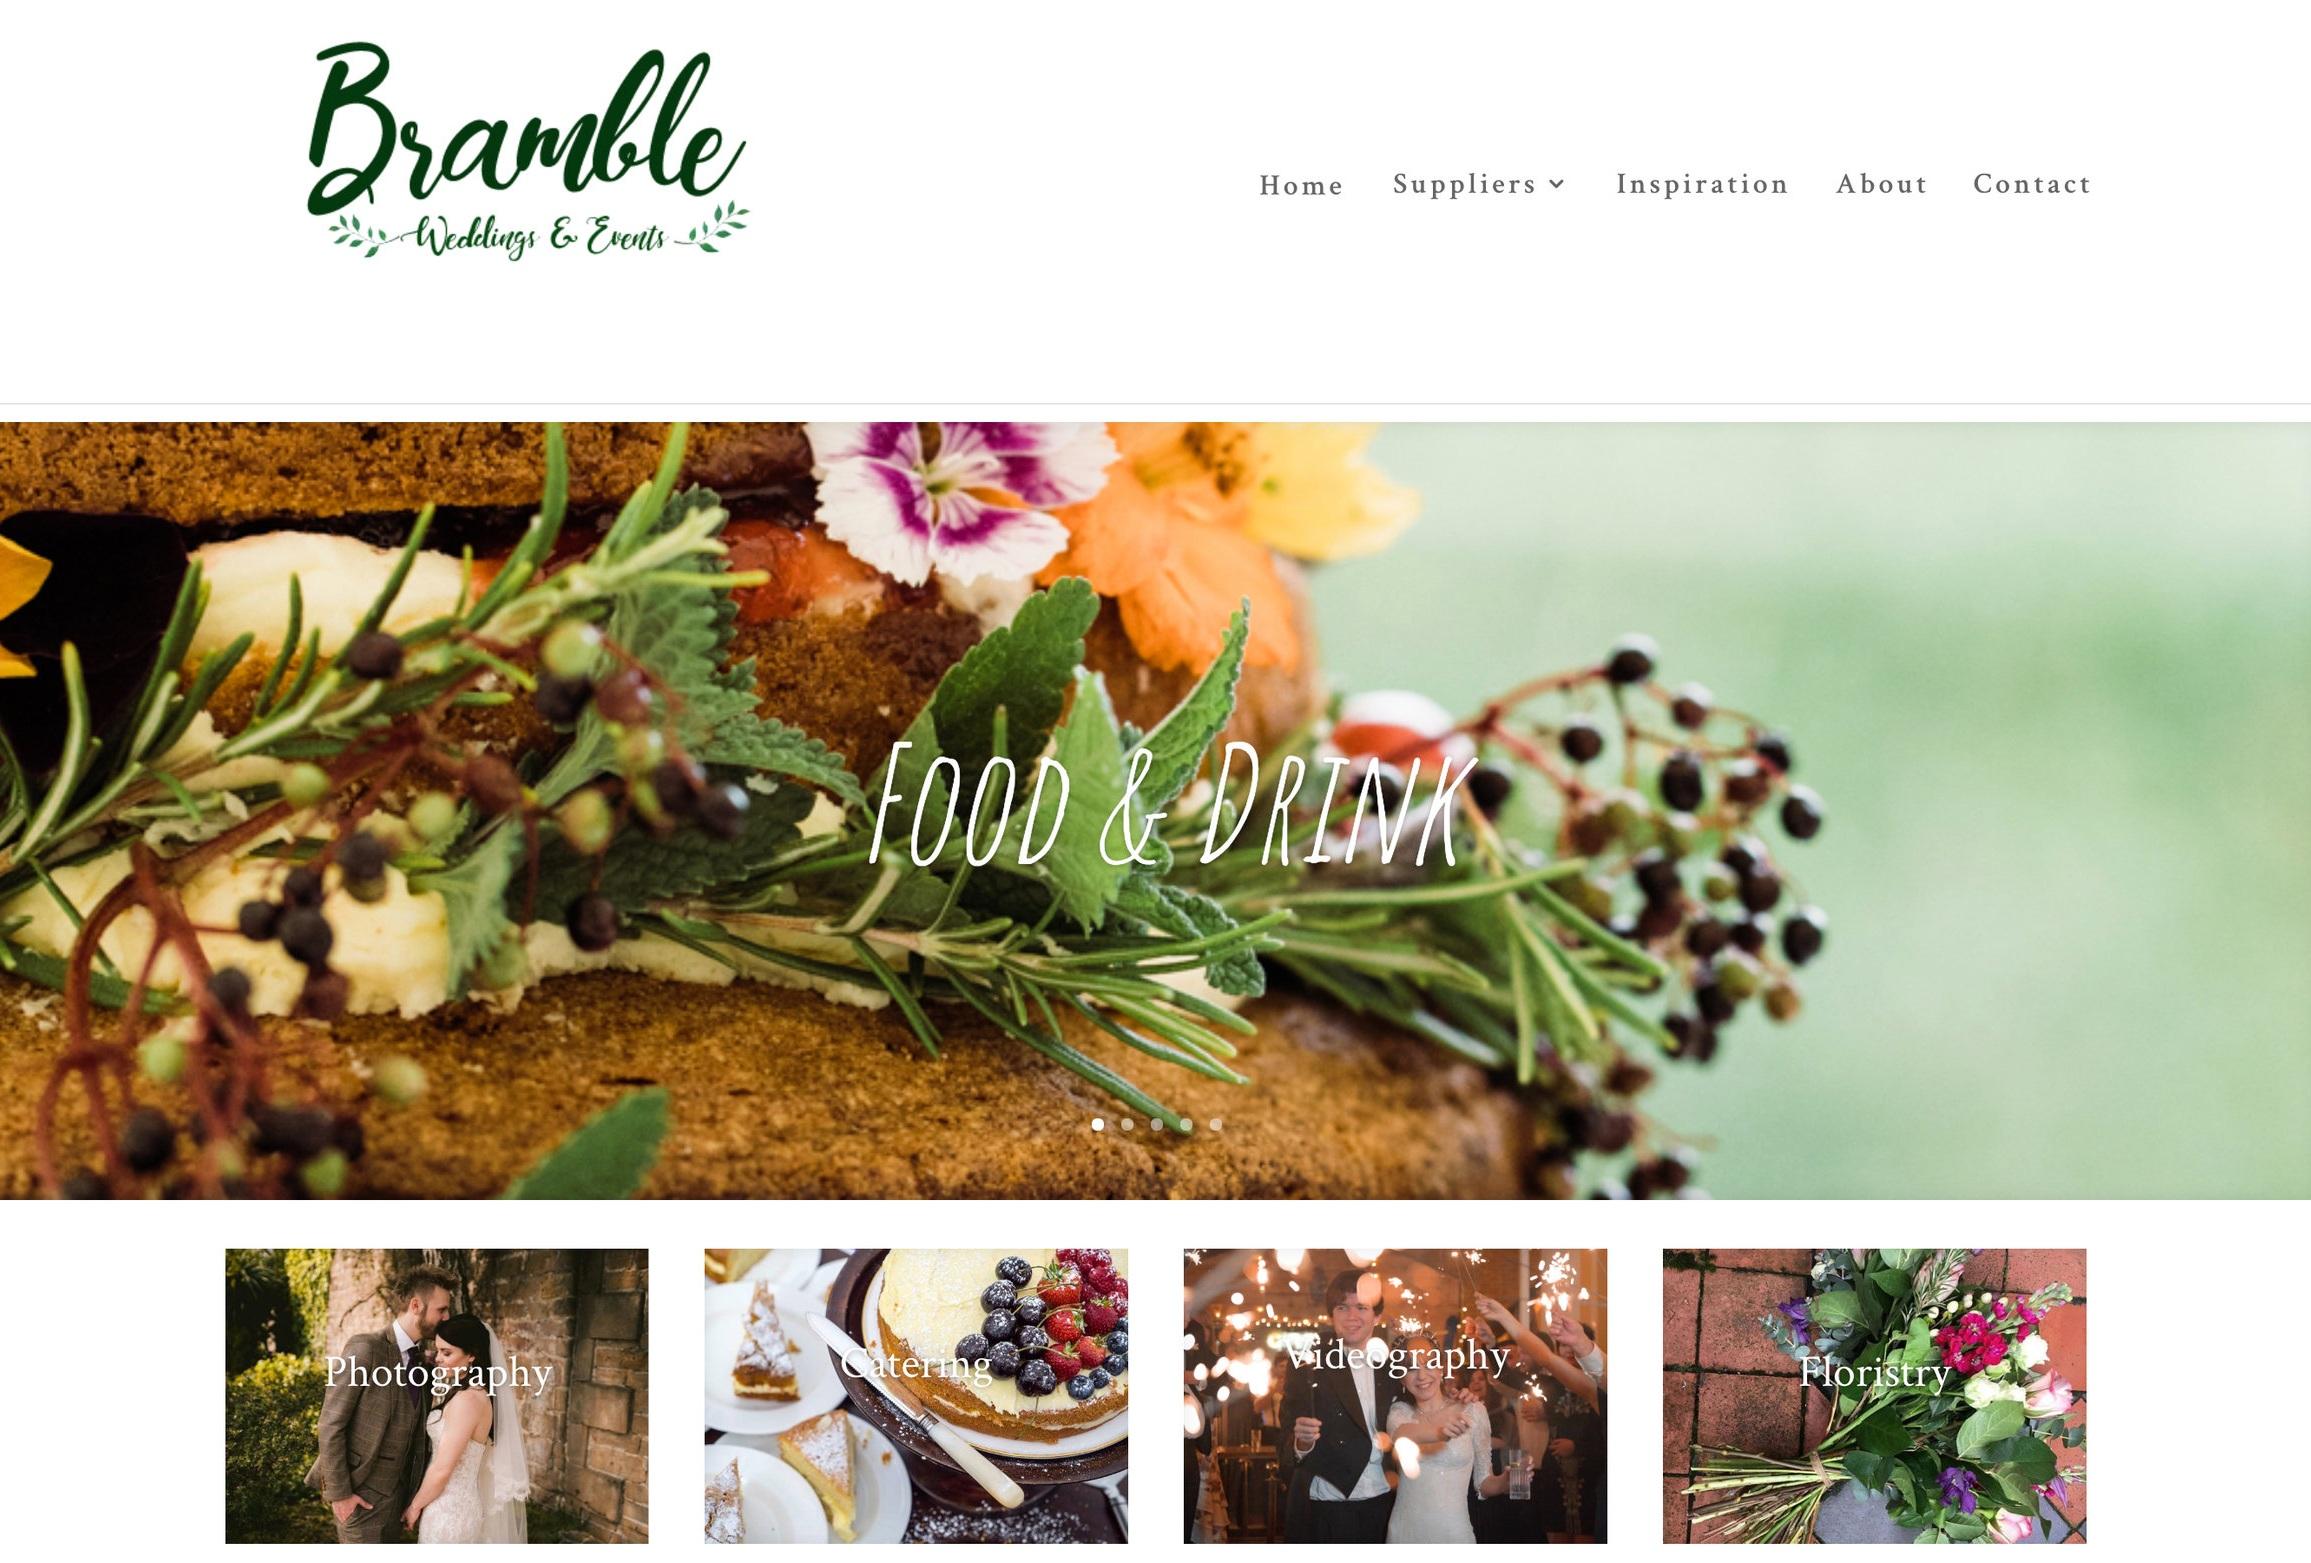 Rosehip+Website+Design+-+Portfolio+-+Bramble+Weddings